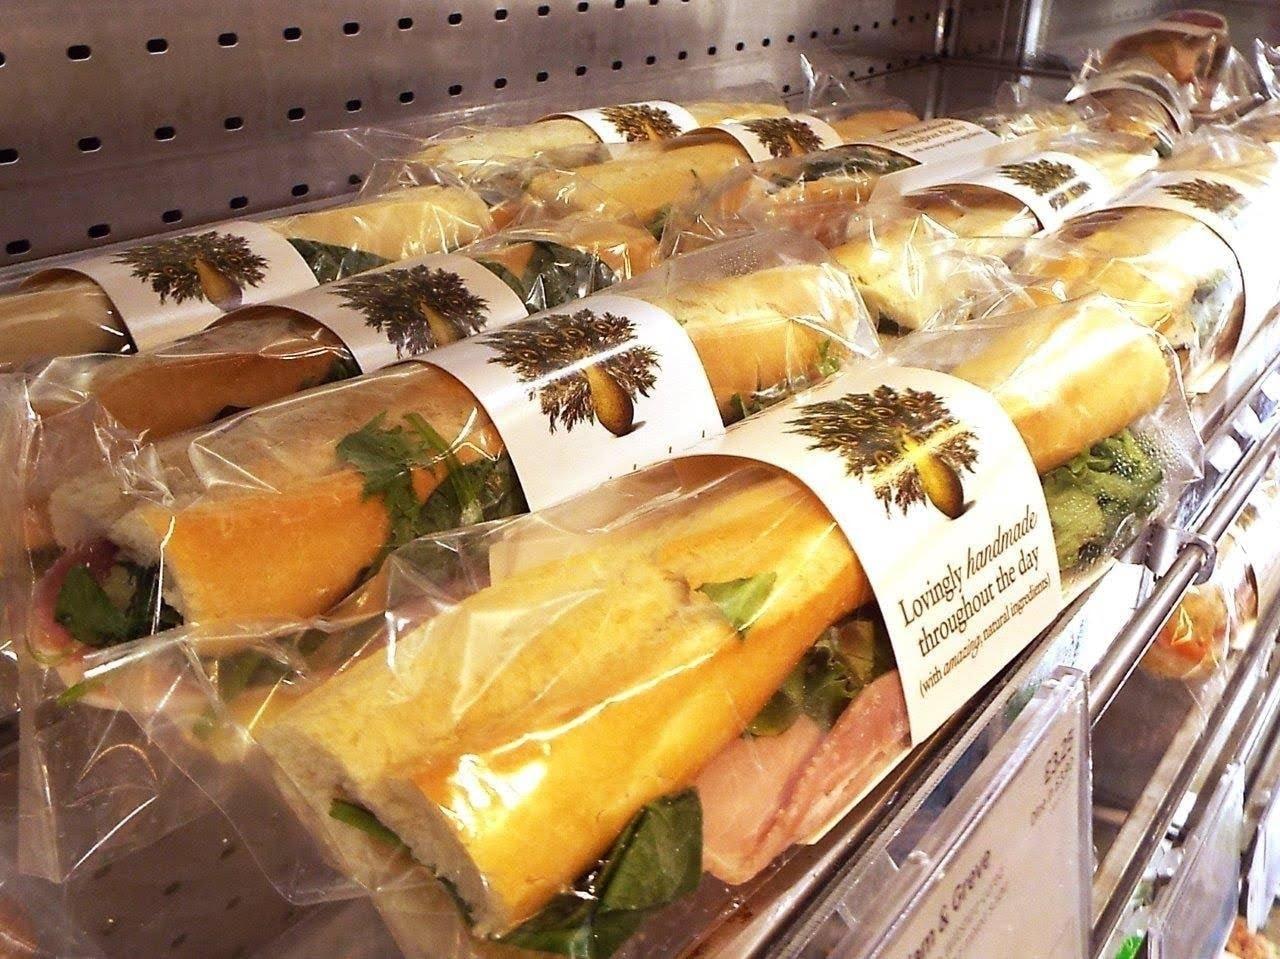 Pret a Manger posh cheese baguettes